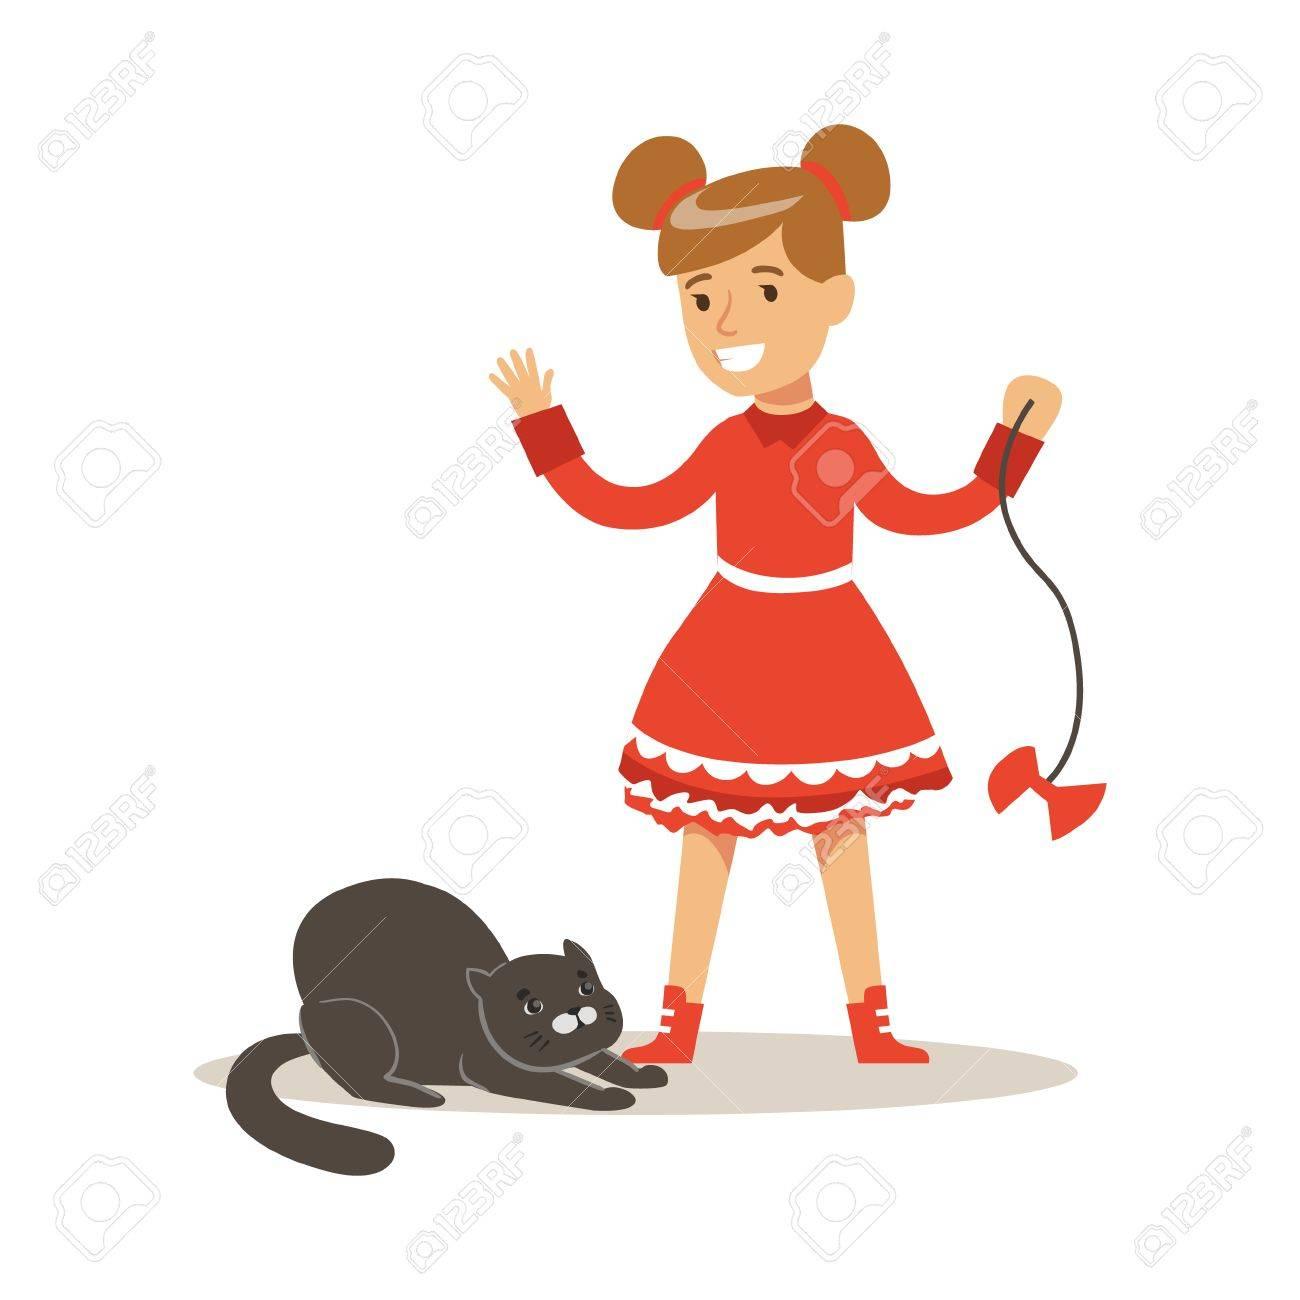 Noir fille rouge chatte